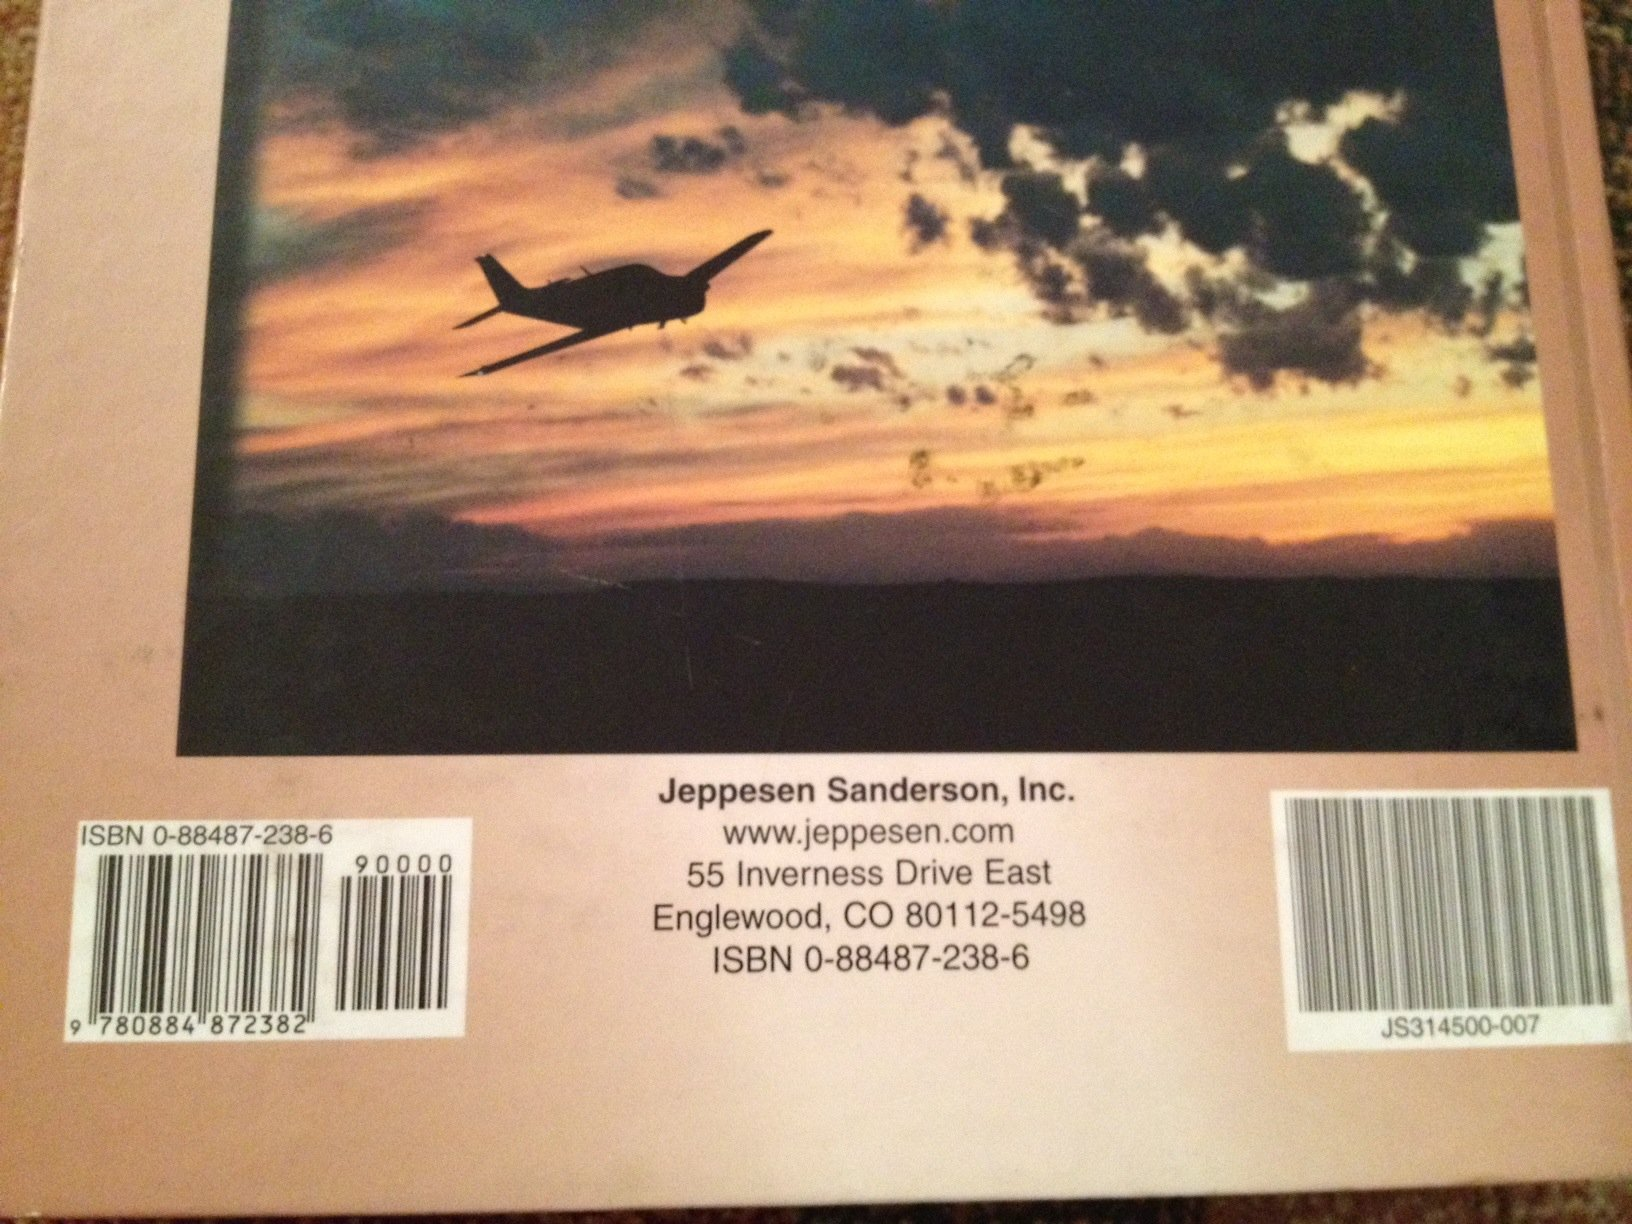 Jeppesen Private Pilot Manual: Jeppeson Sanderson: 9780884872382:  Amazon.com: Books